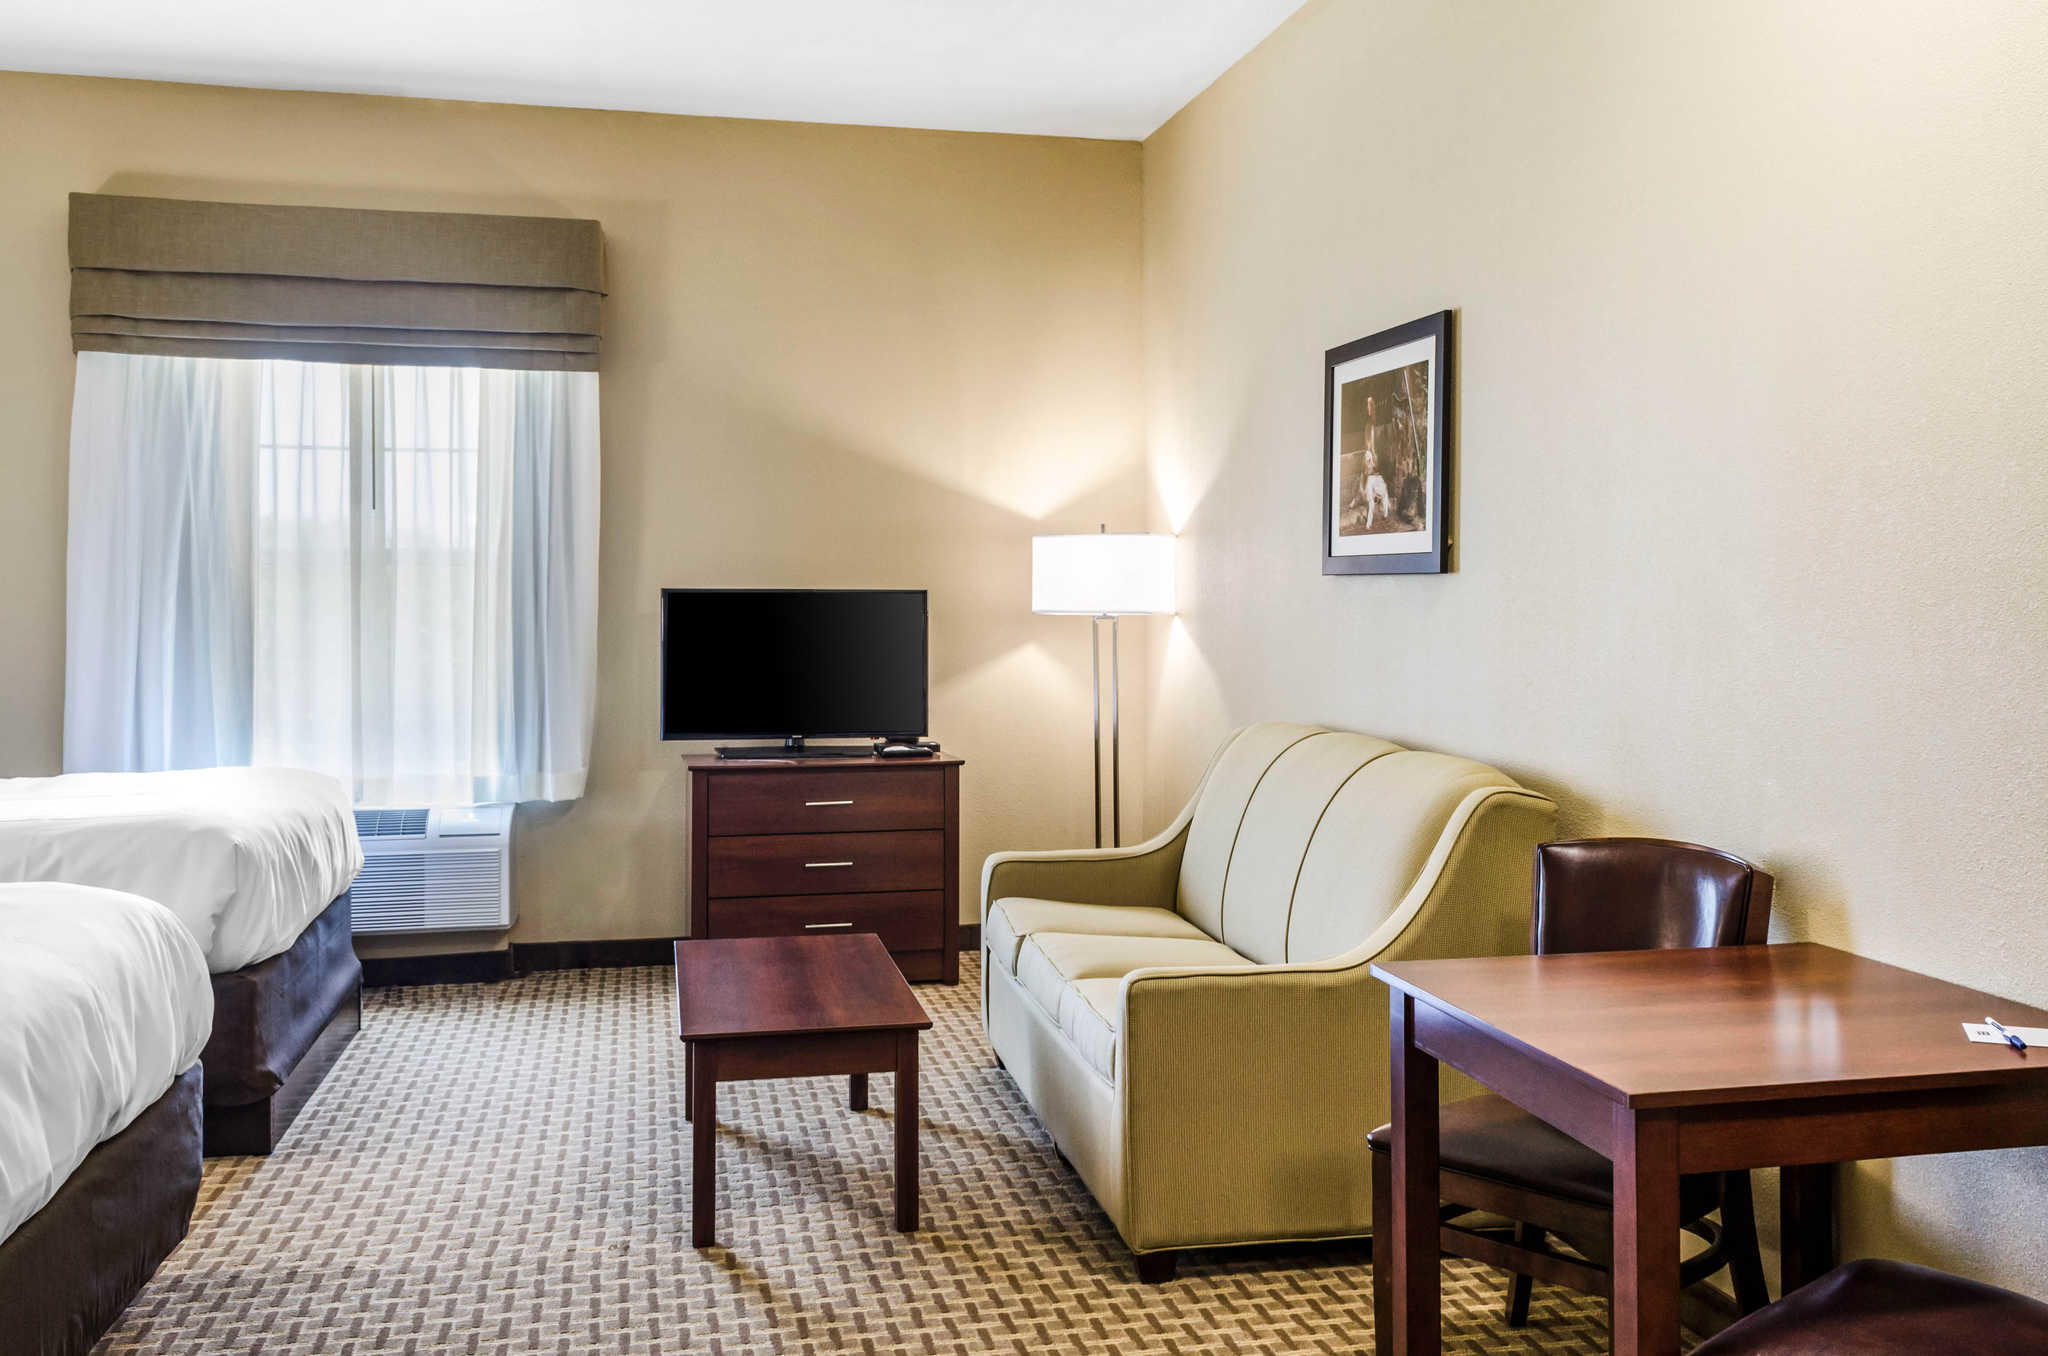 MainStay Suites Hackberry Sportsman's Lodge image 11